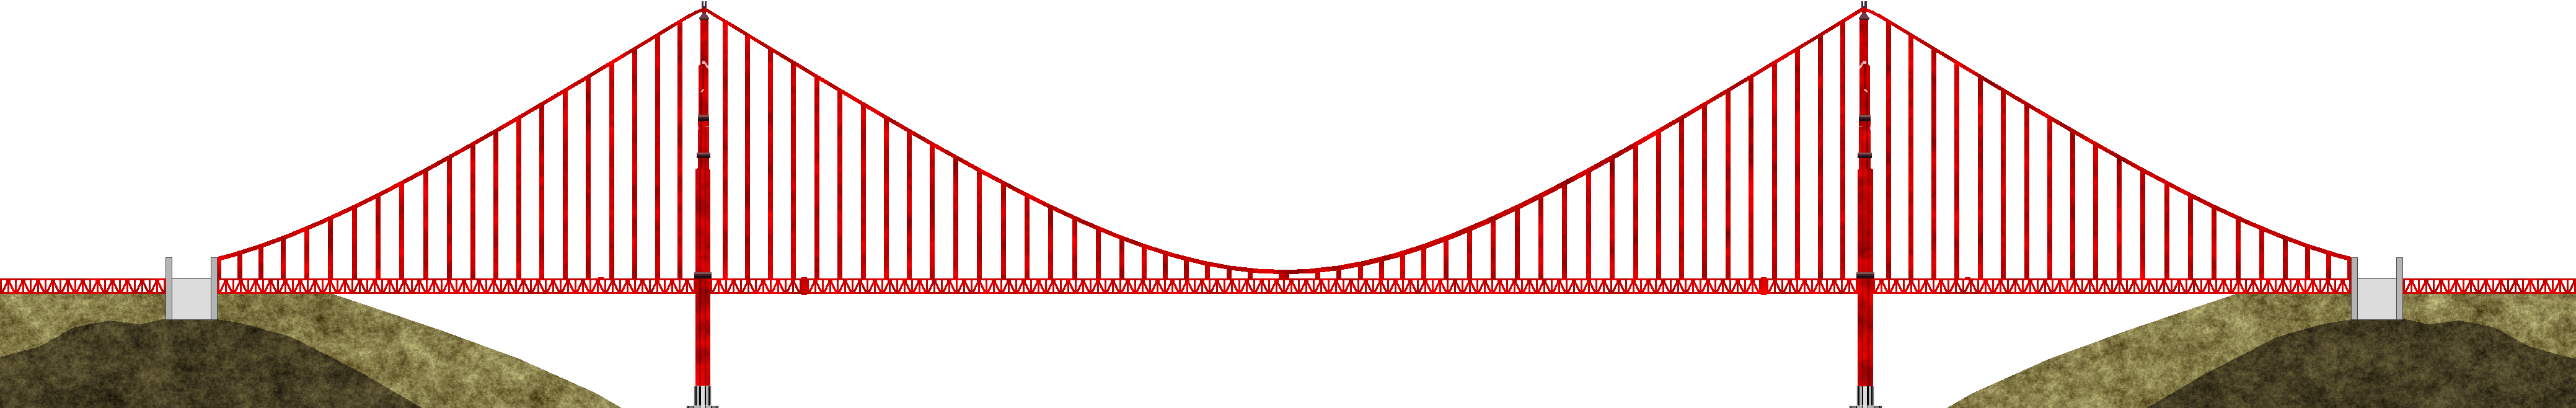 Clip Art Golden Gate Bridge Clipart golden gate bridge free images at clker com vector clip art image